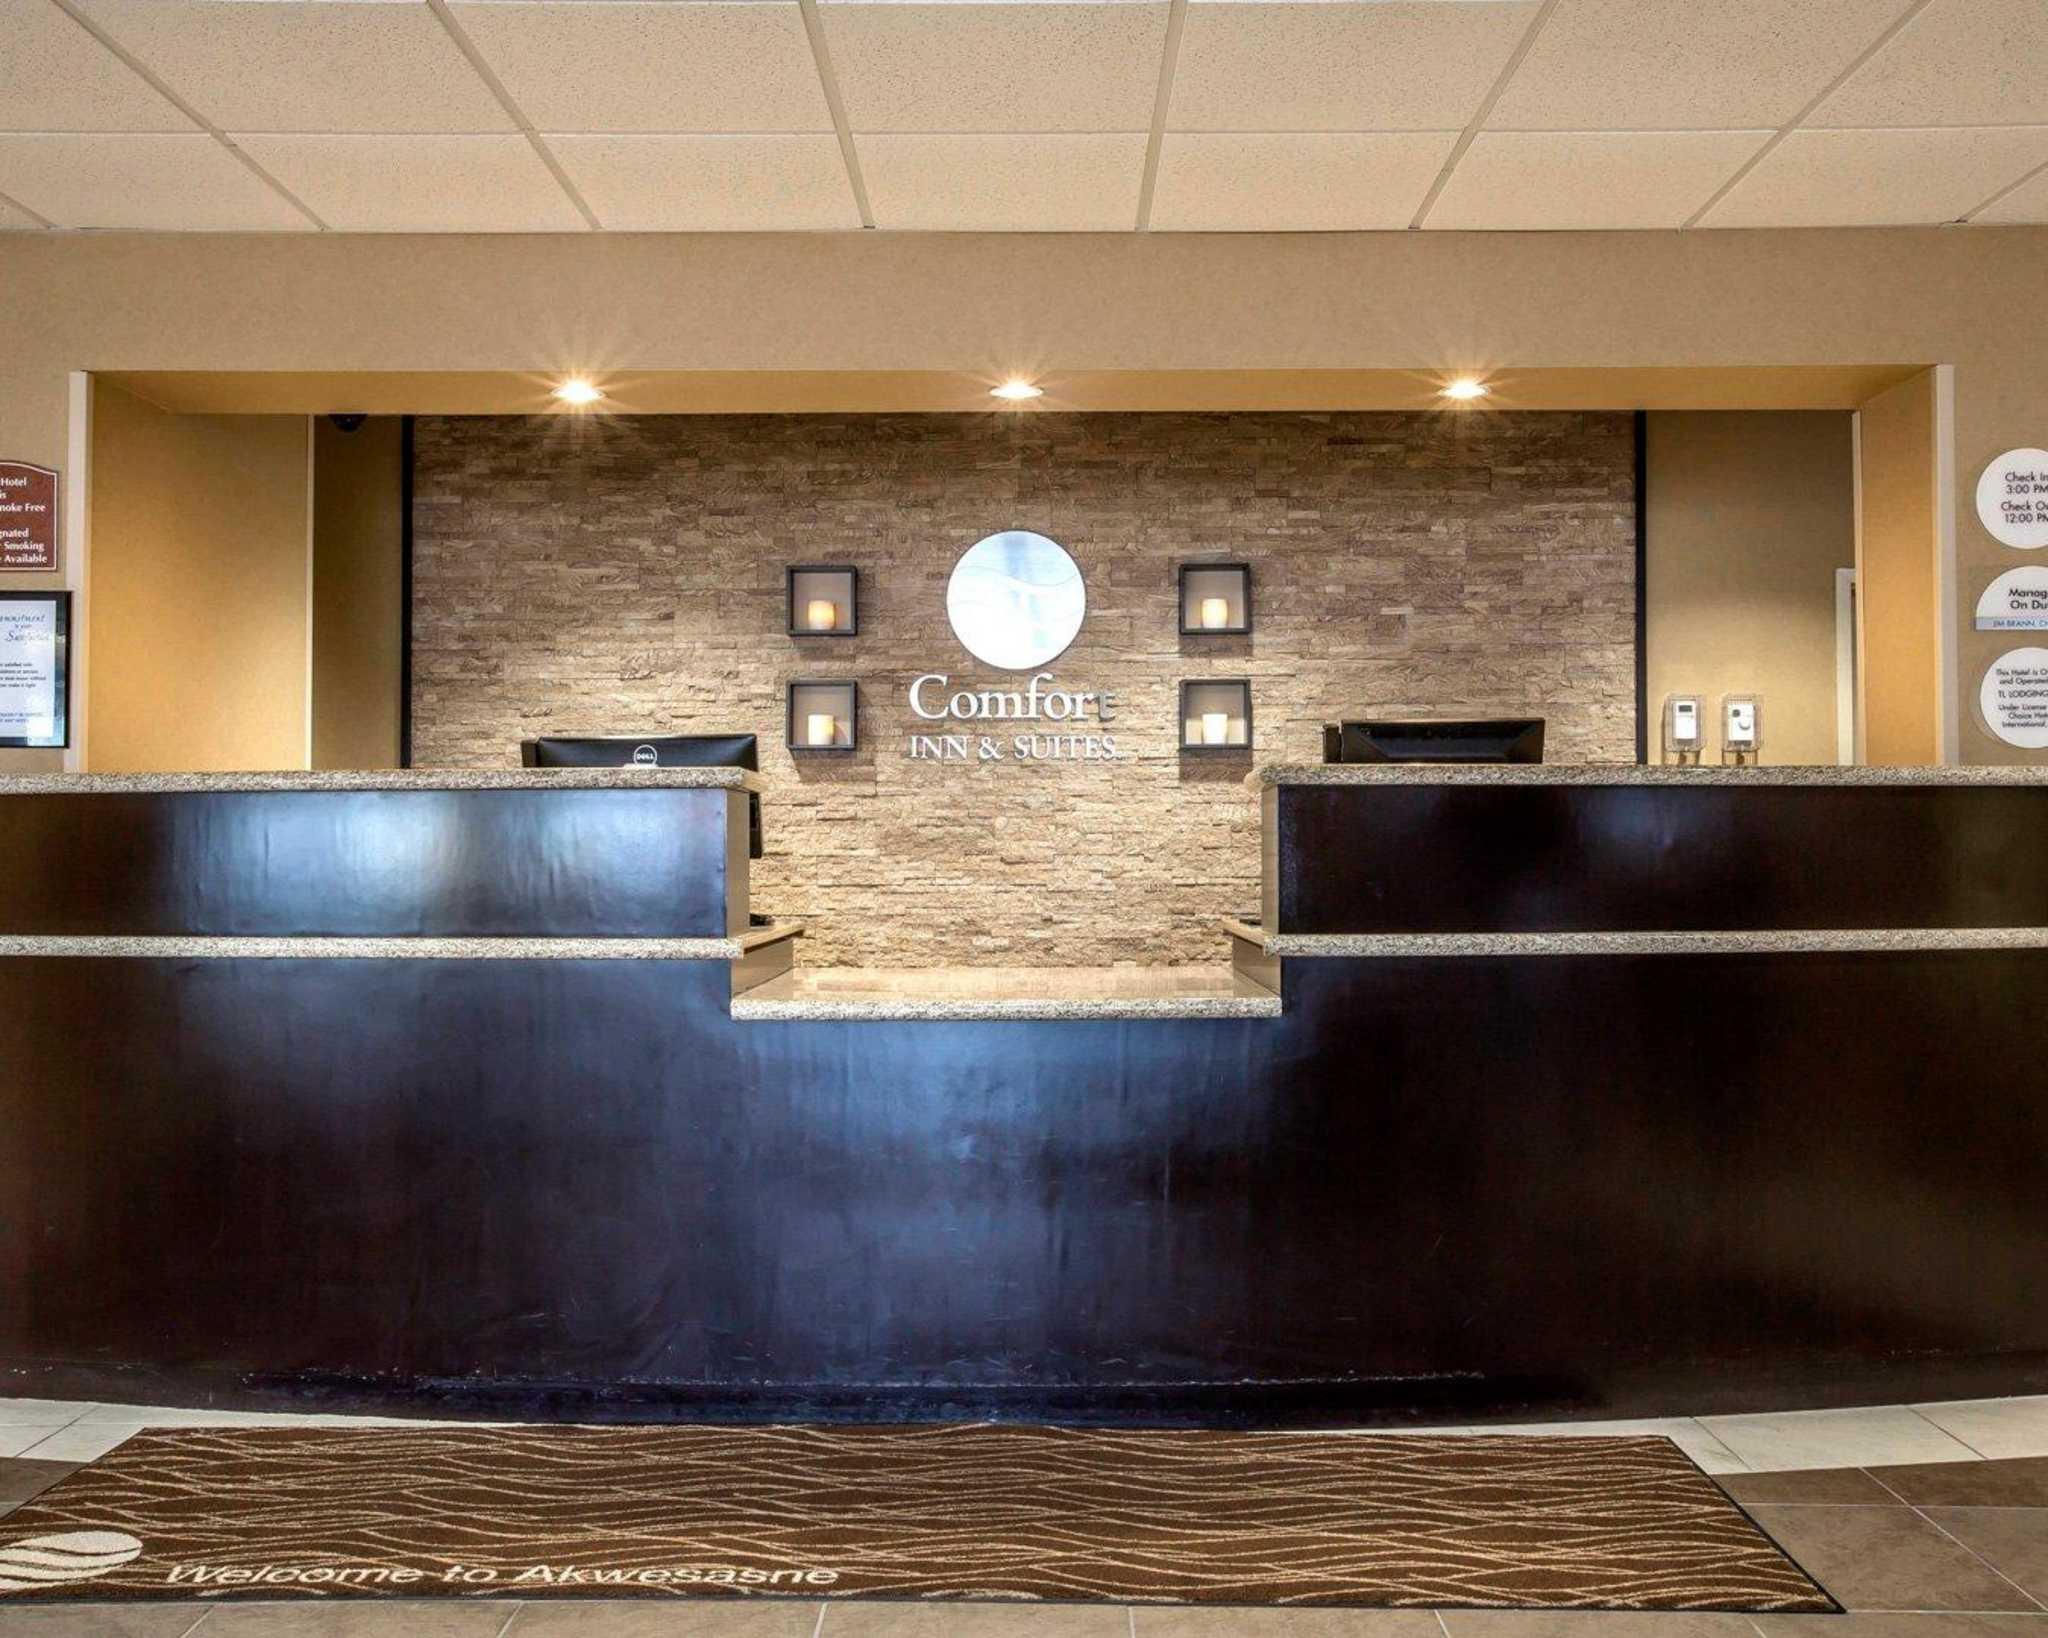 Comfort Inn & Suites adj to Akwesasne Mohawk Casino image 29